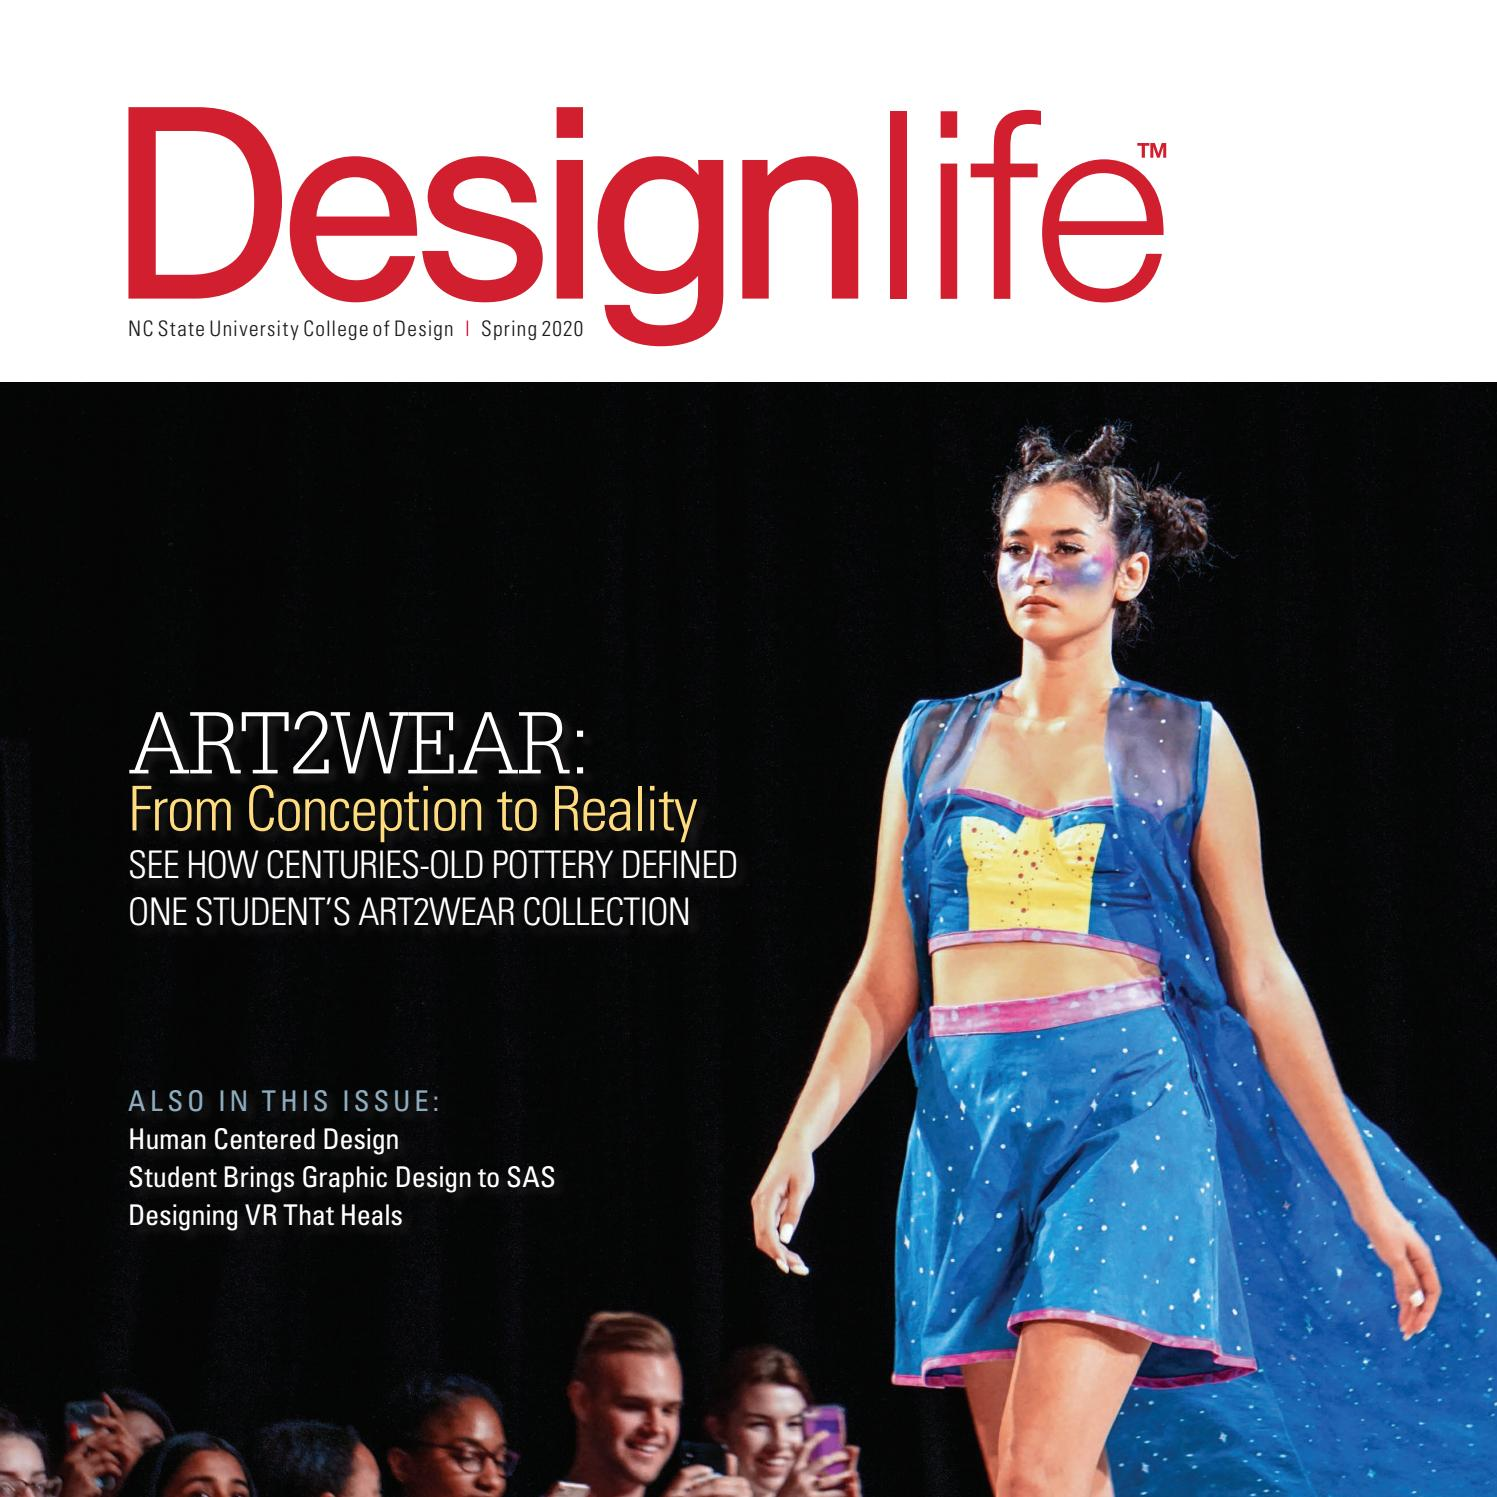 Nc State College Of Design Spring 2020 Designlife Magazine By Nc State College Of Design Issuu